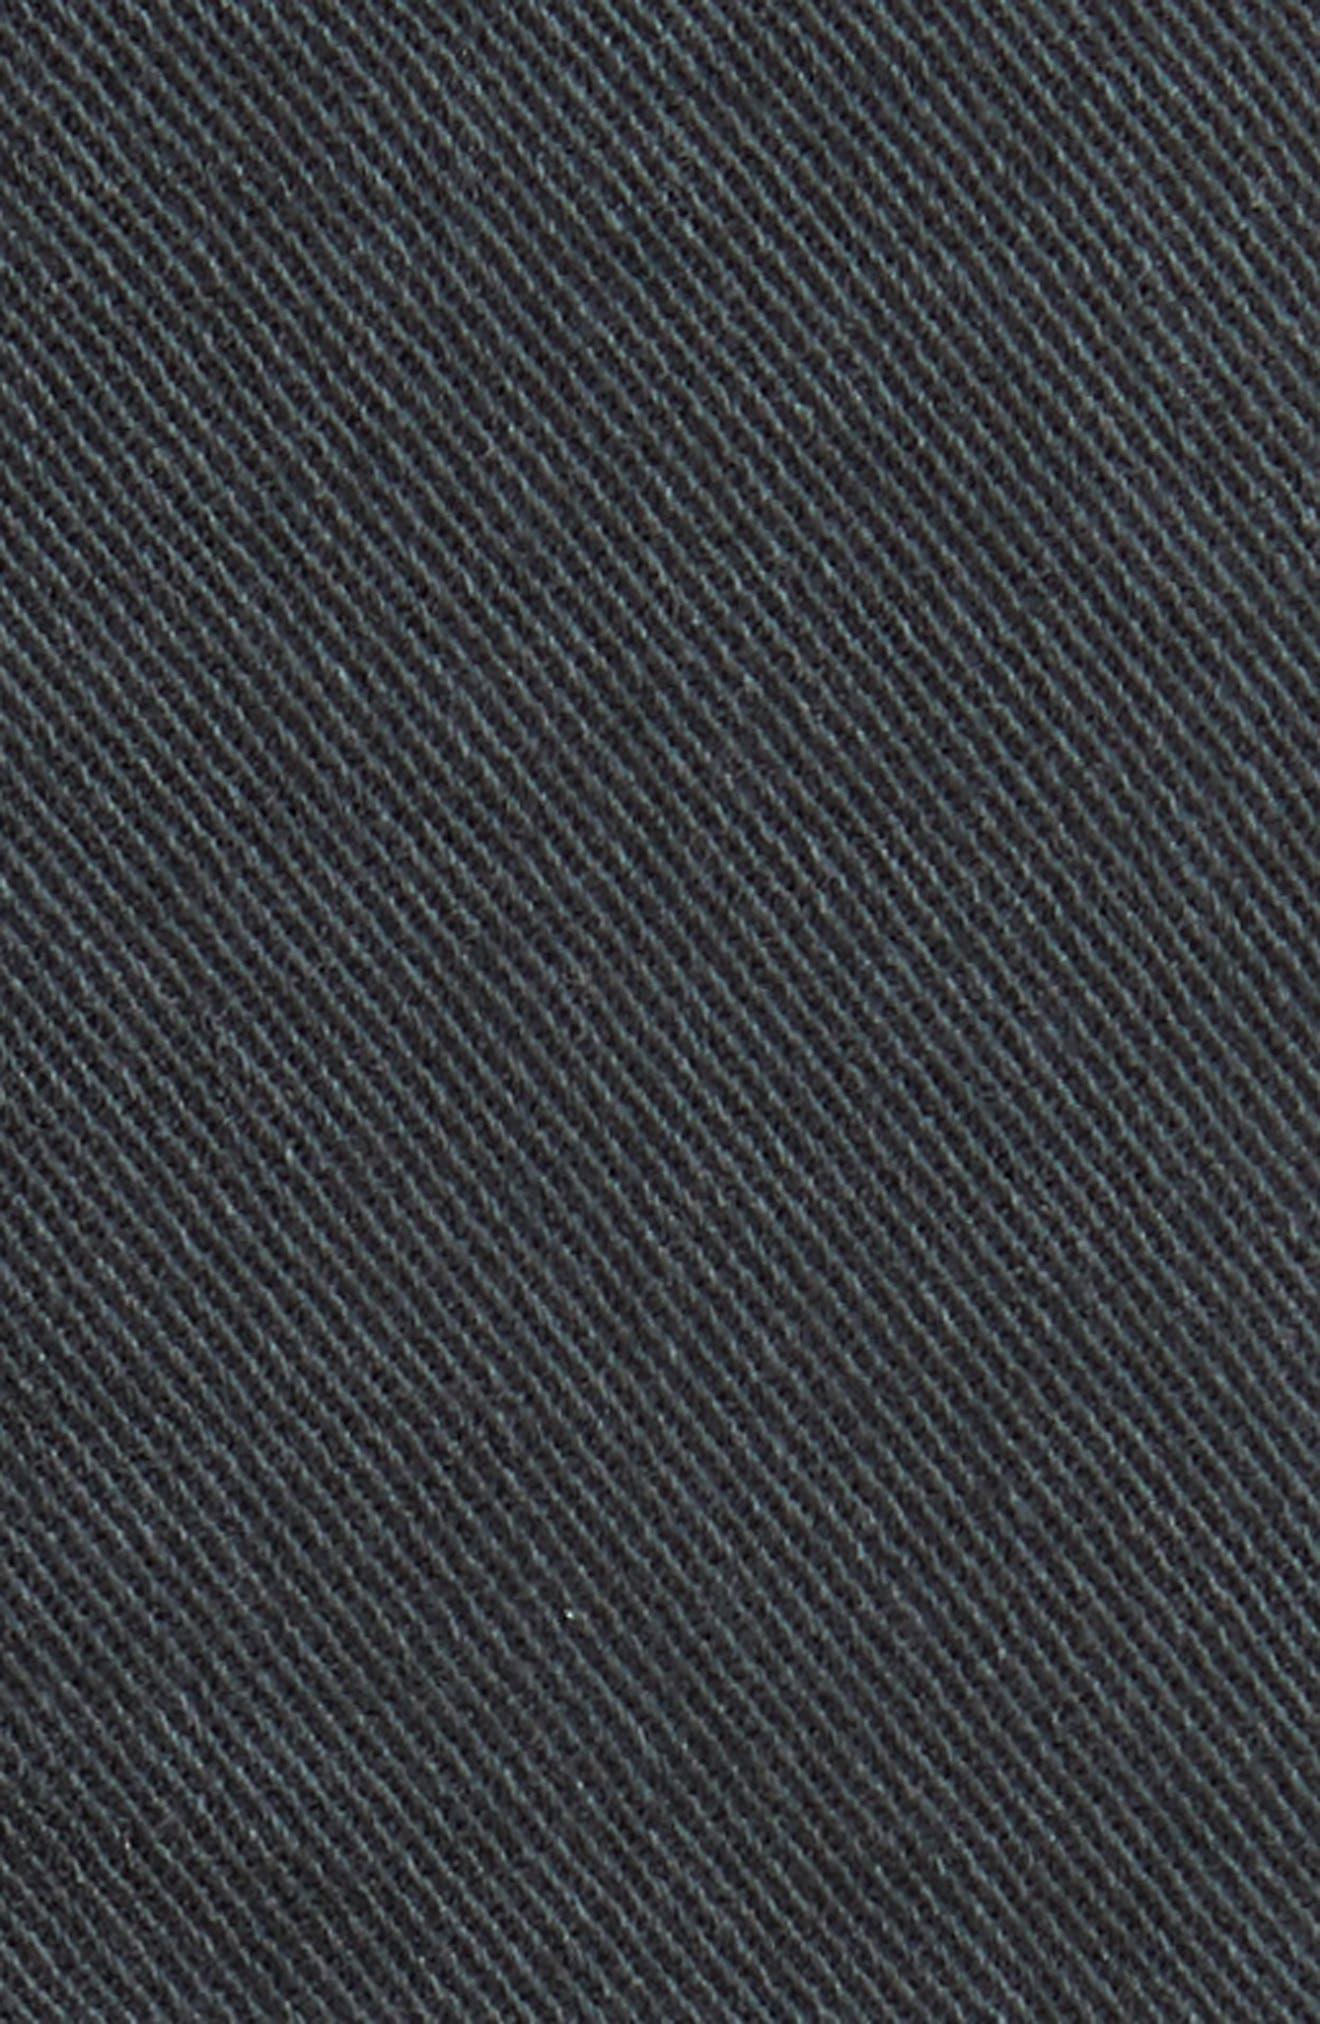 NILI LOTAN, Stretch Cotton Twill Crop Military Pants, Alternate thumbnail 6, color, CARBON